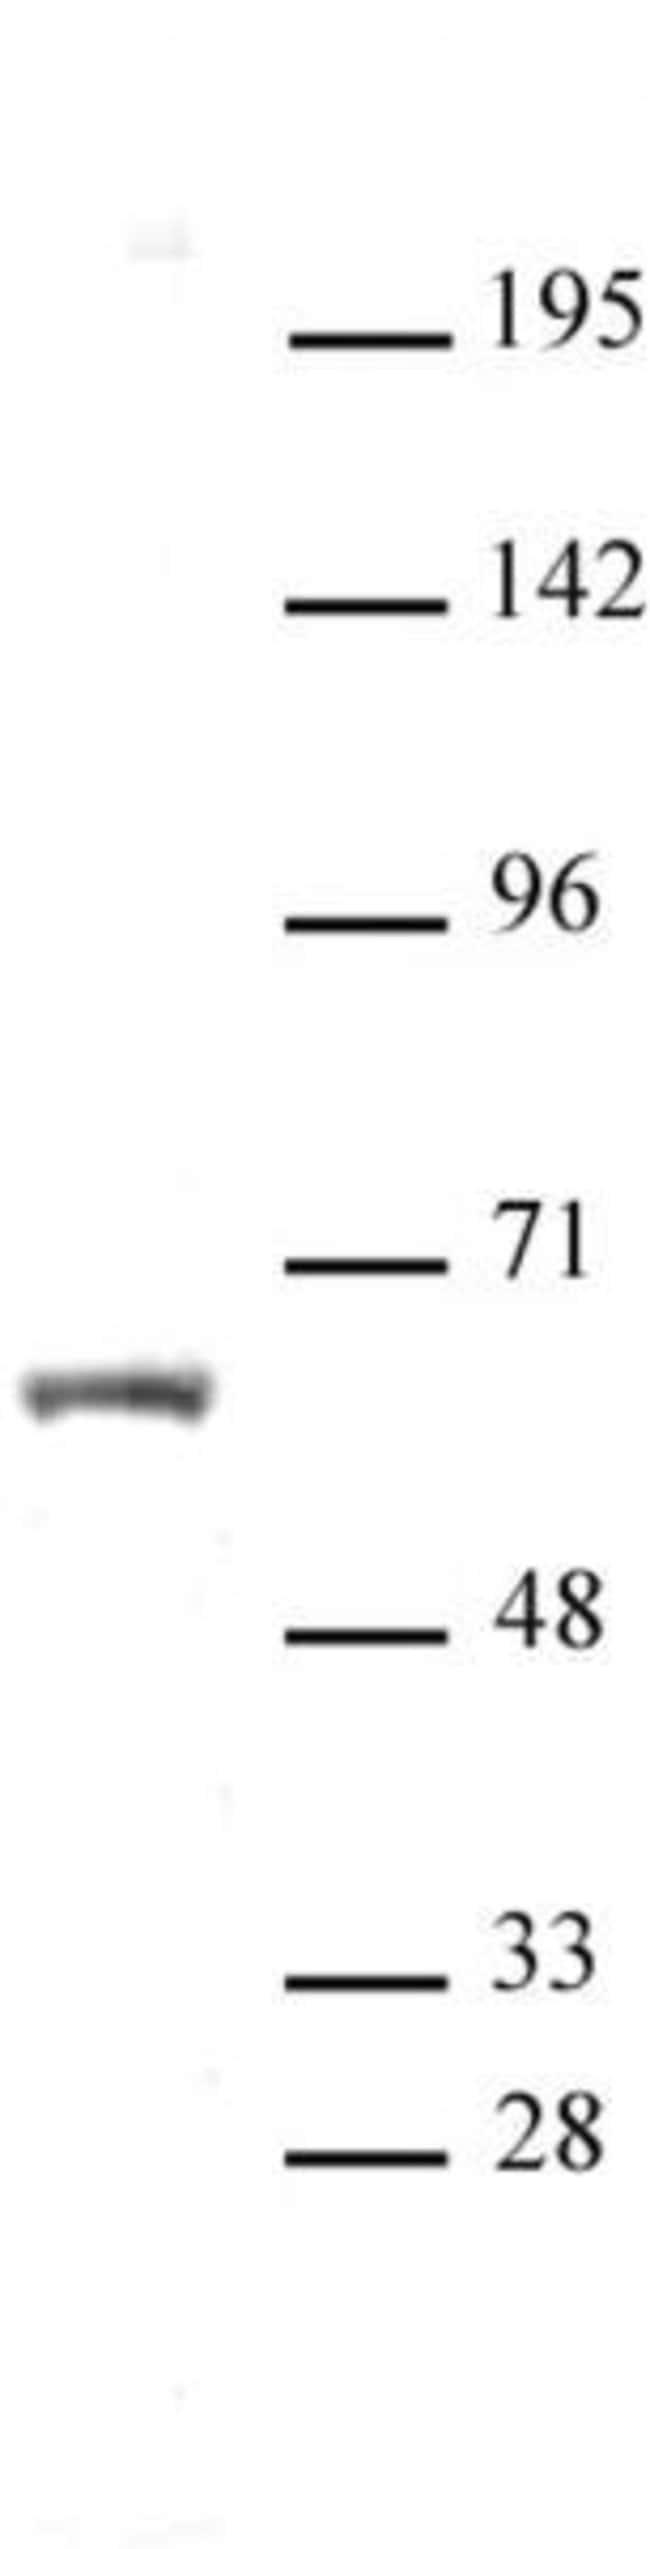 HNF4A Rabbit anti-Human, Unconjugated, Polyclonal, Active Motif:Antibodies:Primary